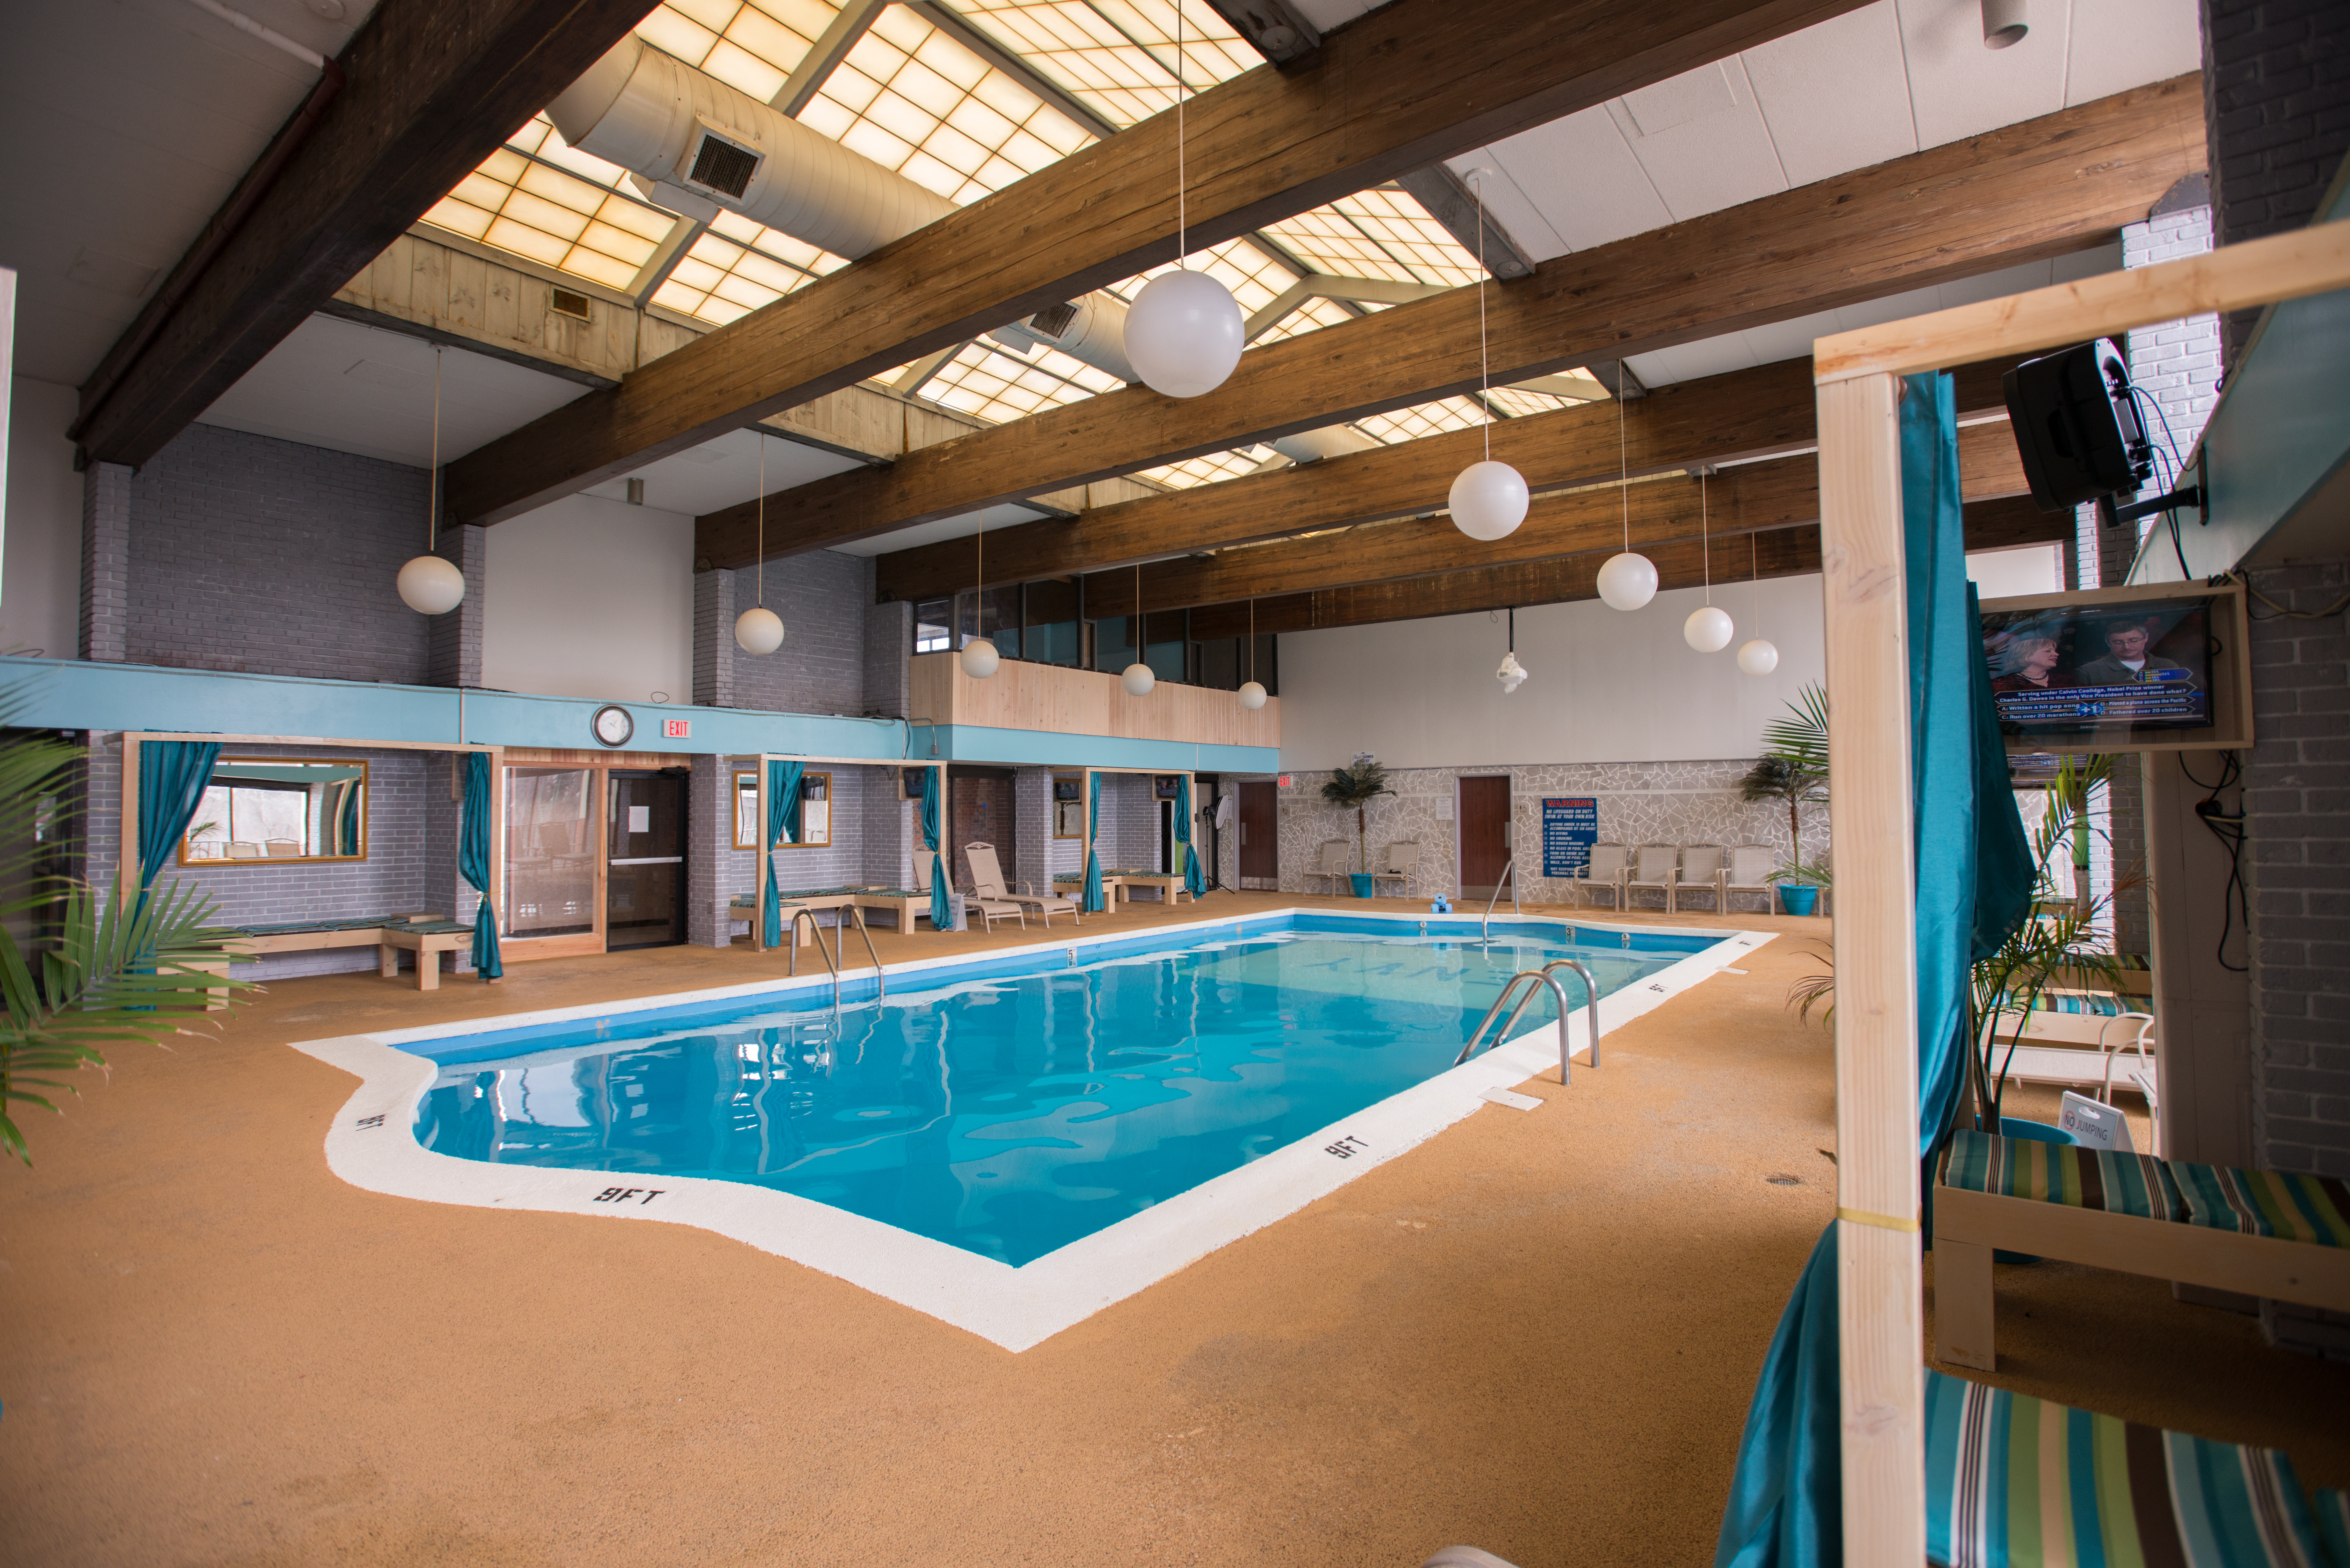 Poolside Envy Oasis